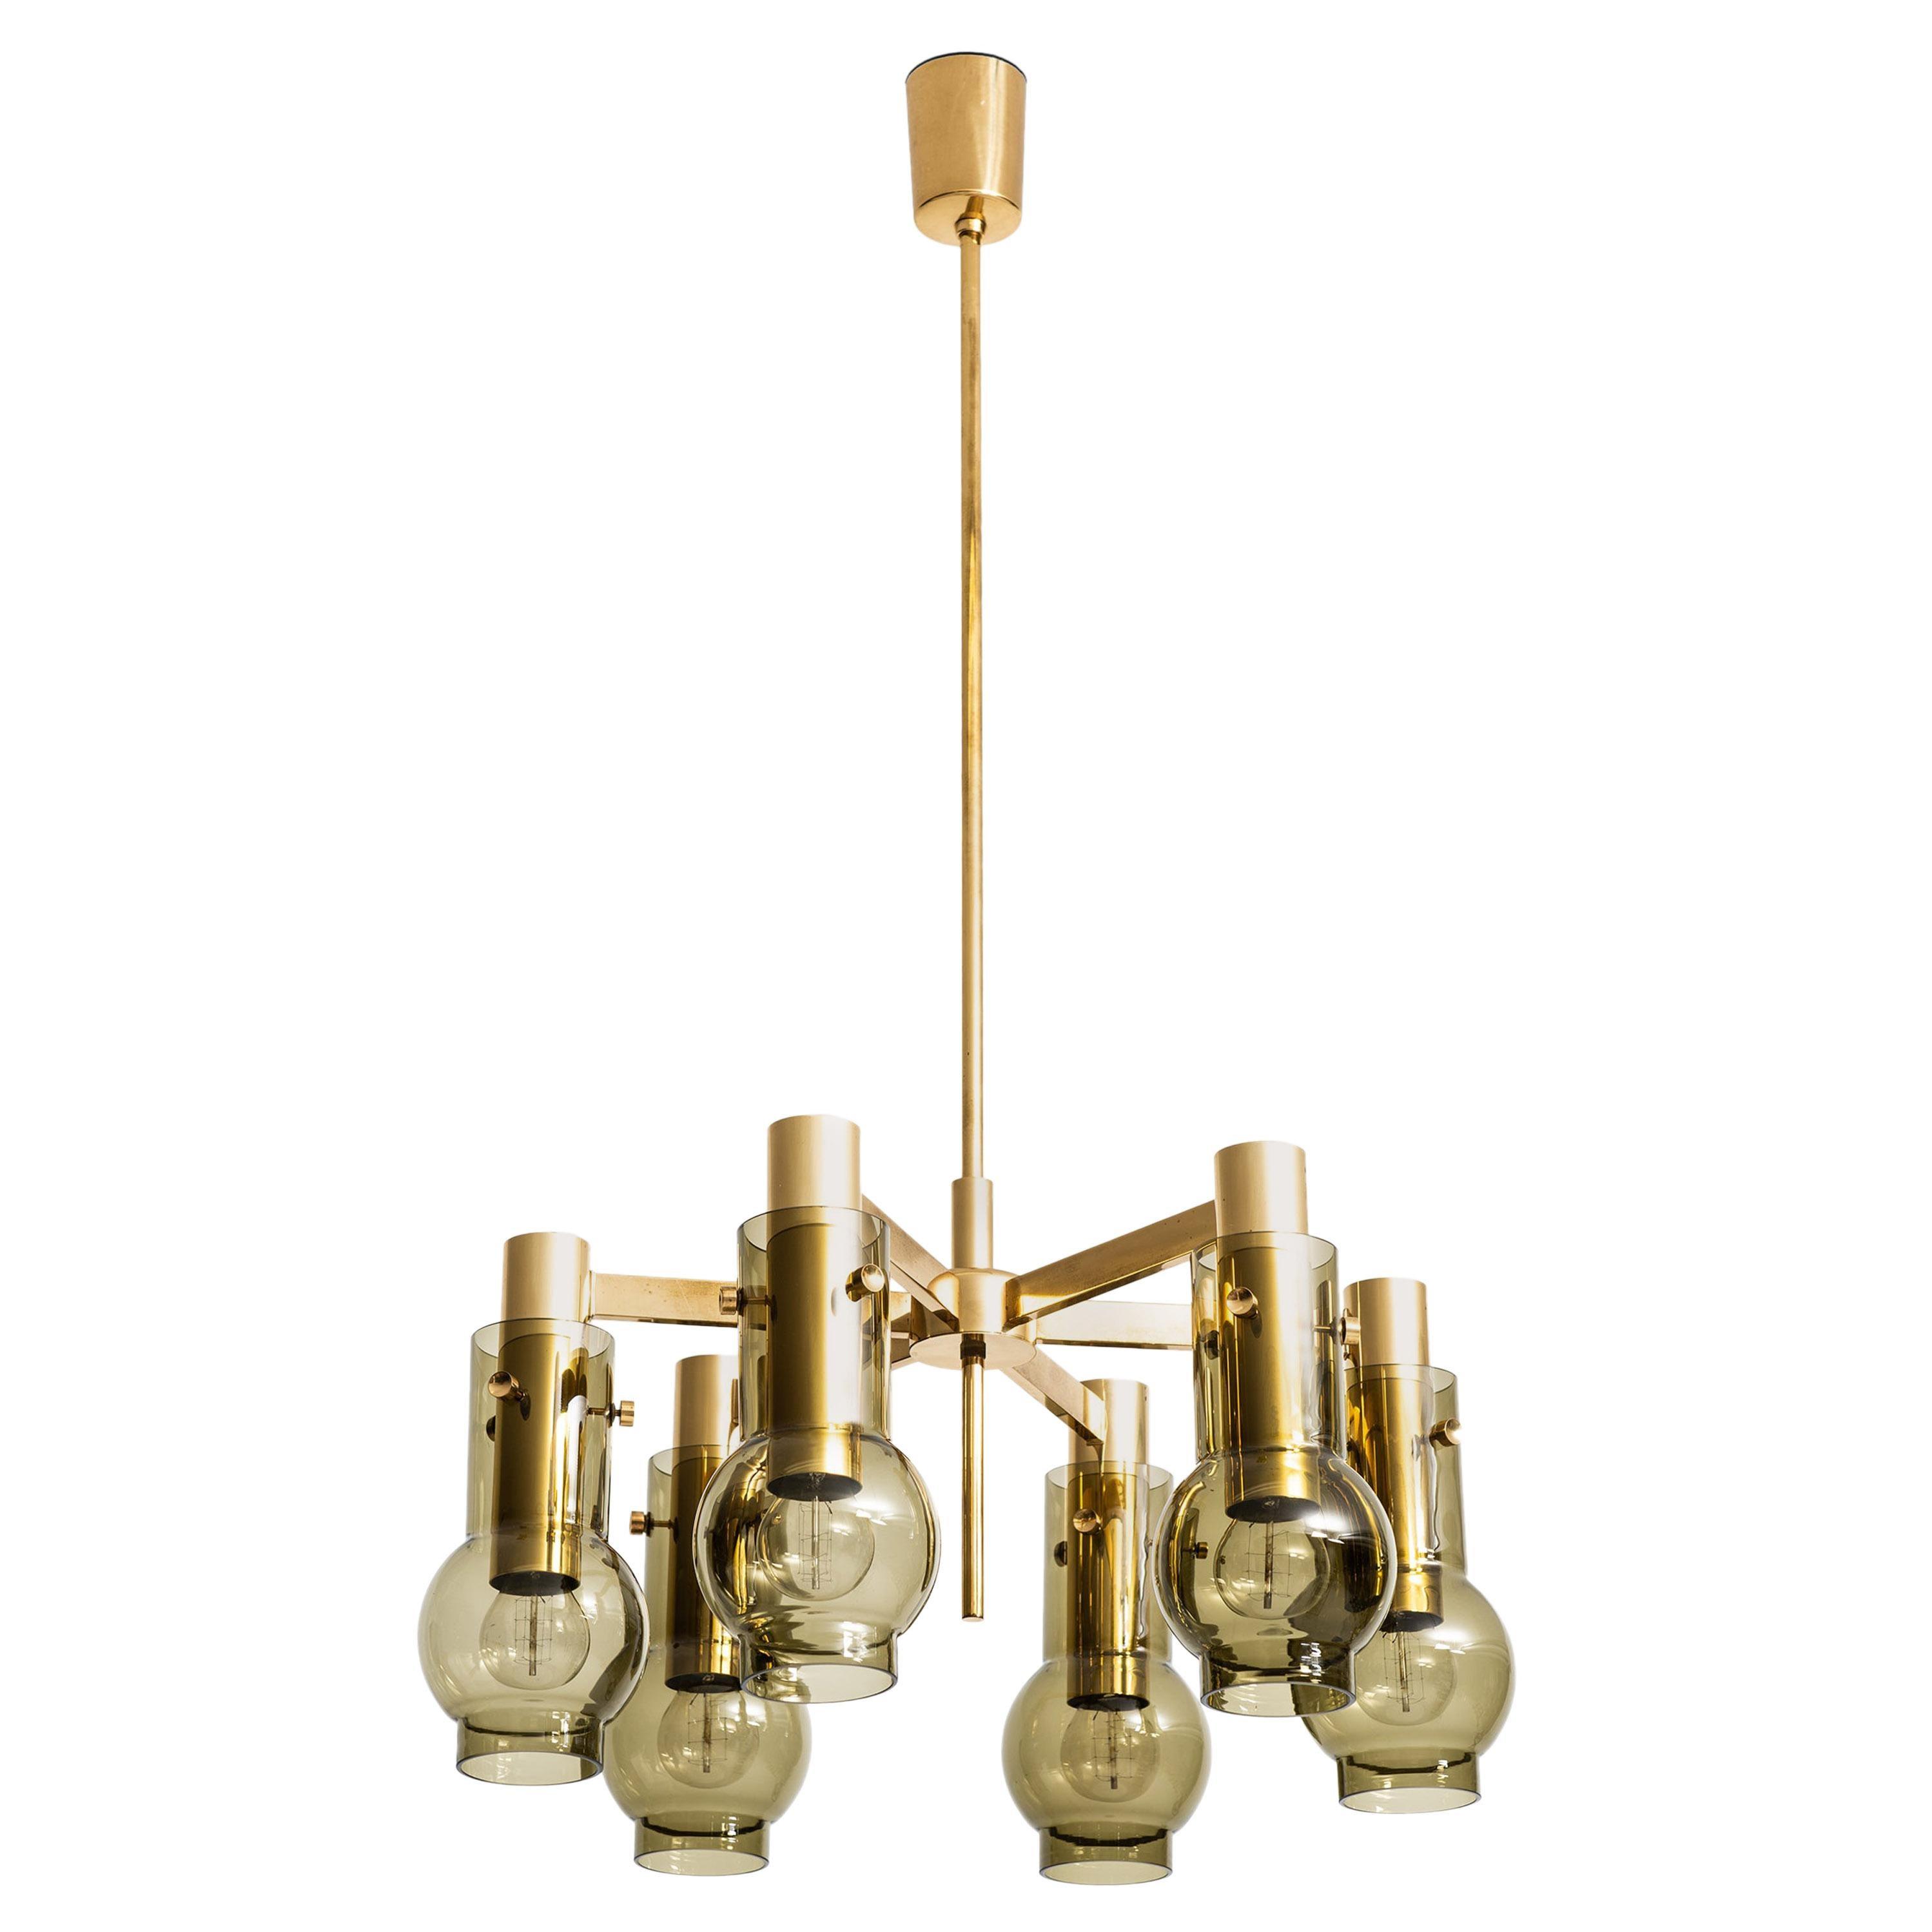 Hans-Agne Jakobsson Ceiling Lamp by Hans-Agne Jakobsson AB in Sweden